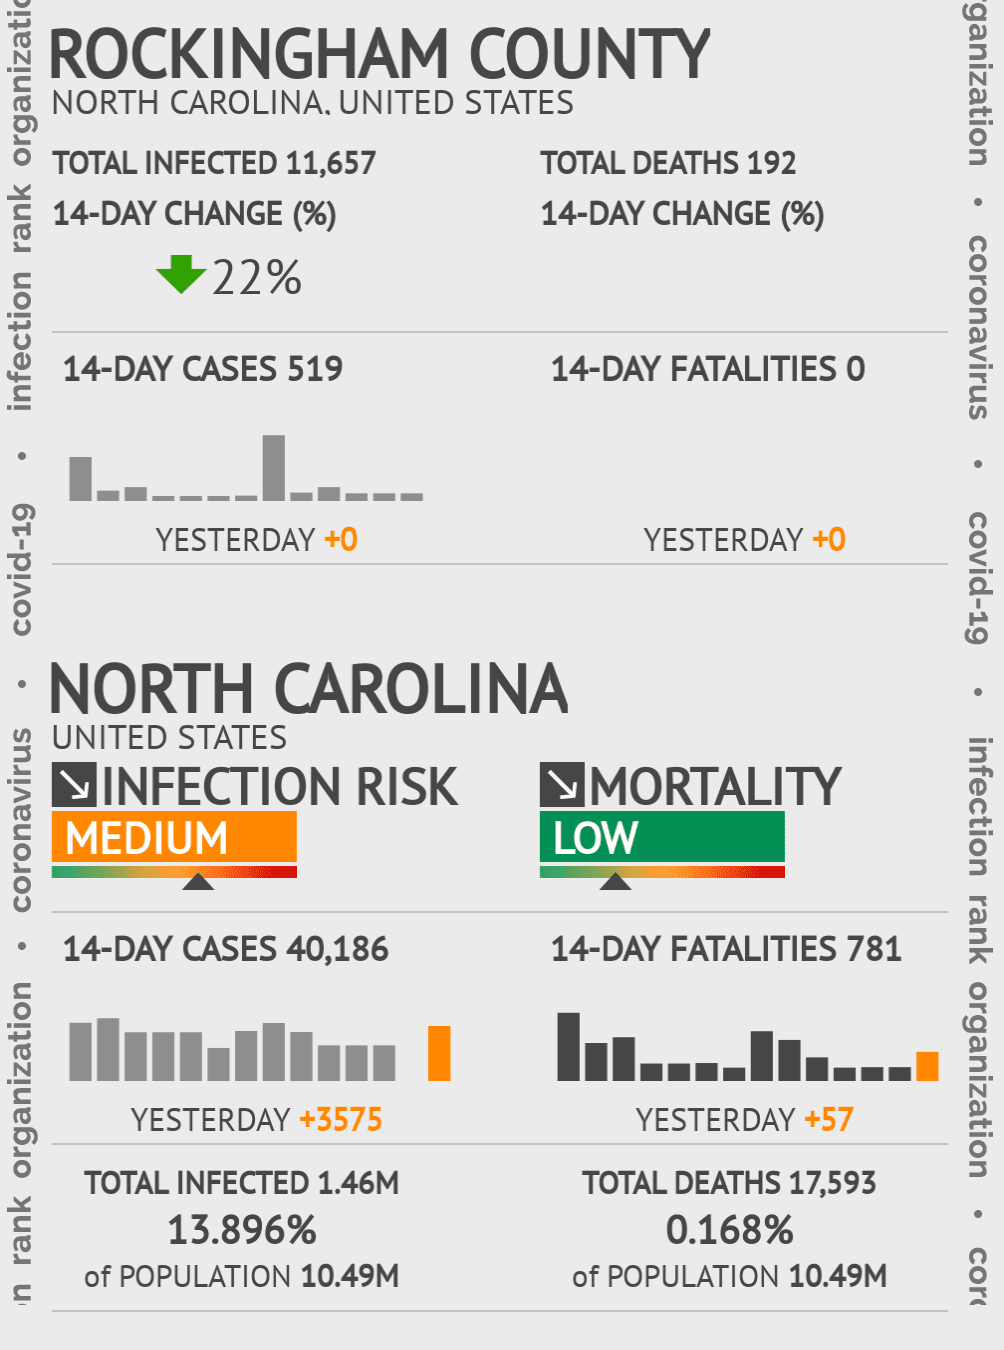 Rockingham County Coronavirus Covid-19 Risk of Infection on January 14, 2021